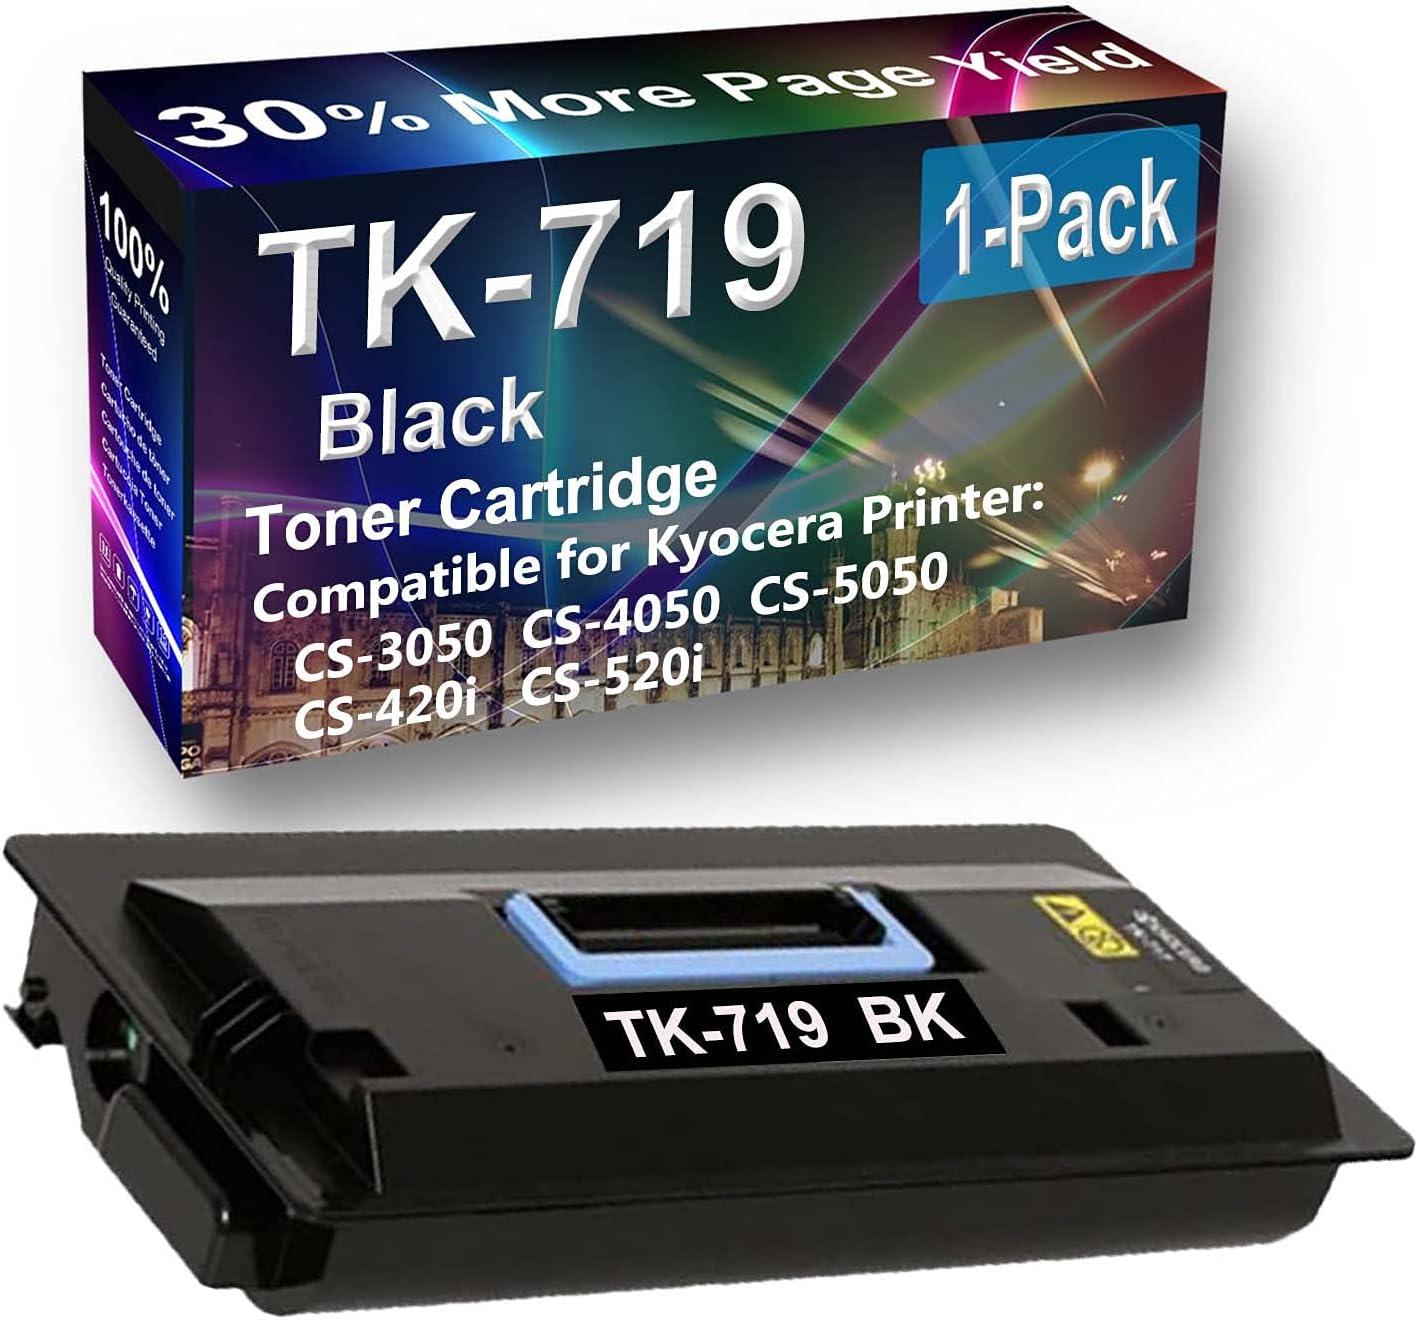 1-Pack Compatible High Yield CS-520i Laser Printer Toner Cartridge Replacement for Kyocera TK719 (TK-719) Printer Cartridge (Black)